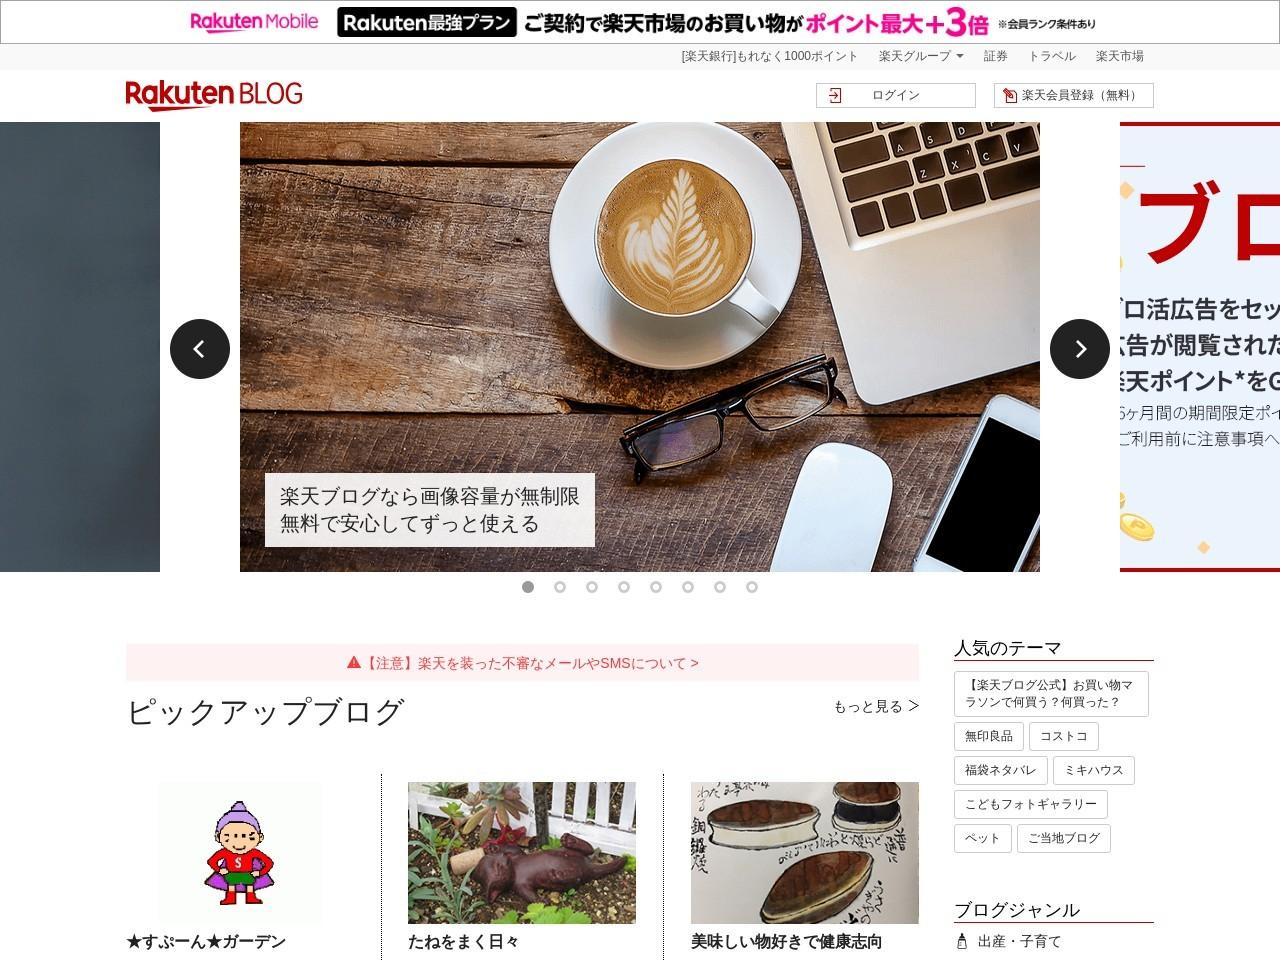 http://plaza.rakuten.co.jp/seoulkoera/